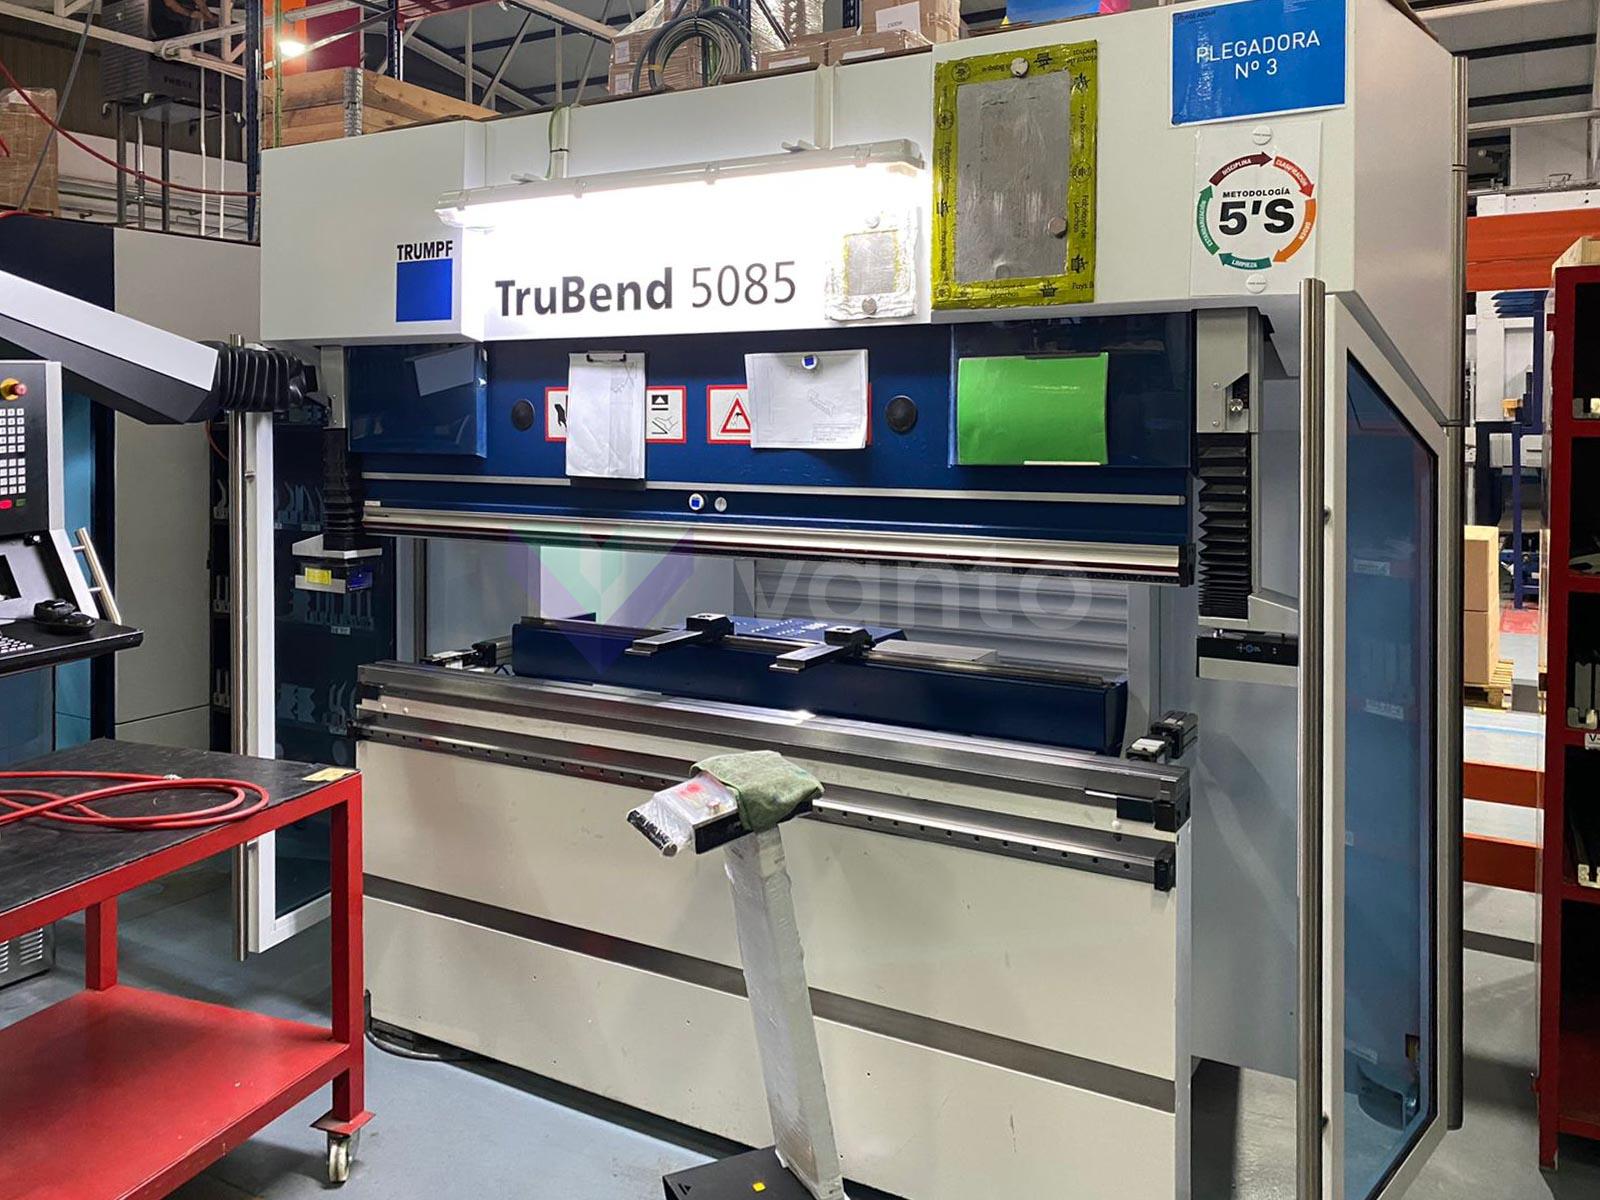 TRUMPF TruBend 5085 CNC Bending machine (2014) id10443